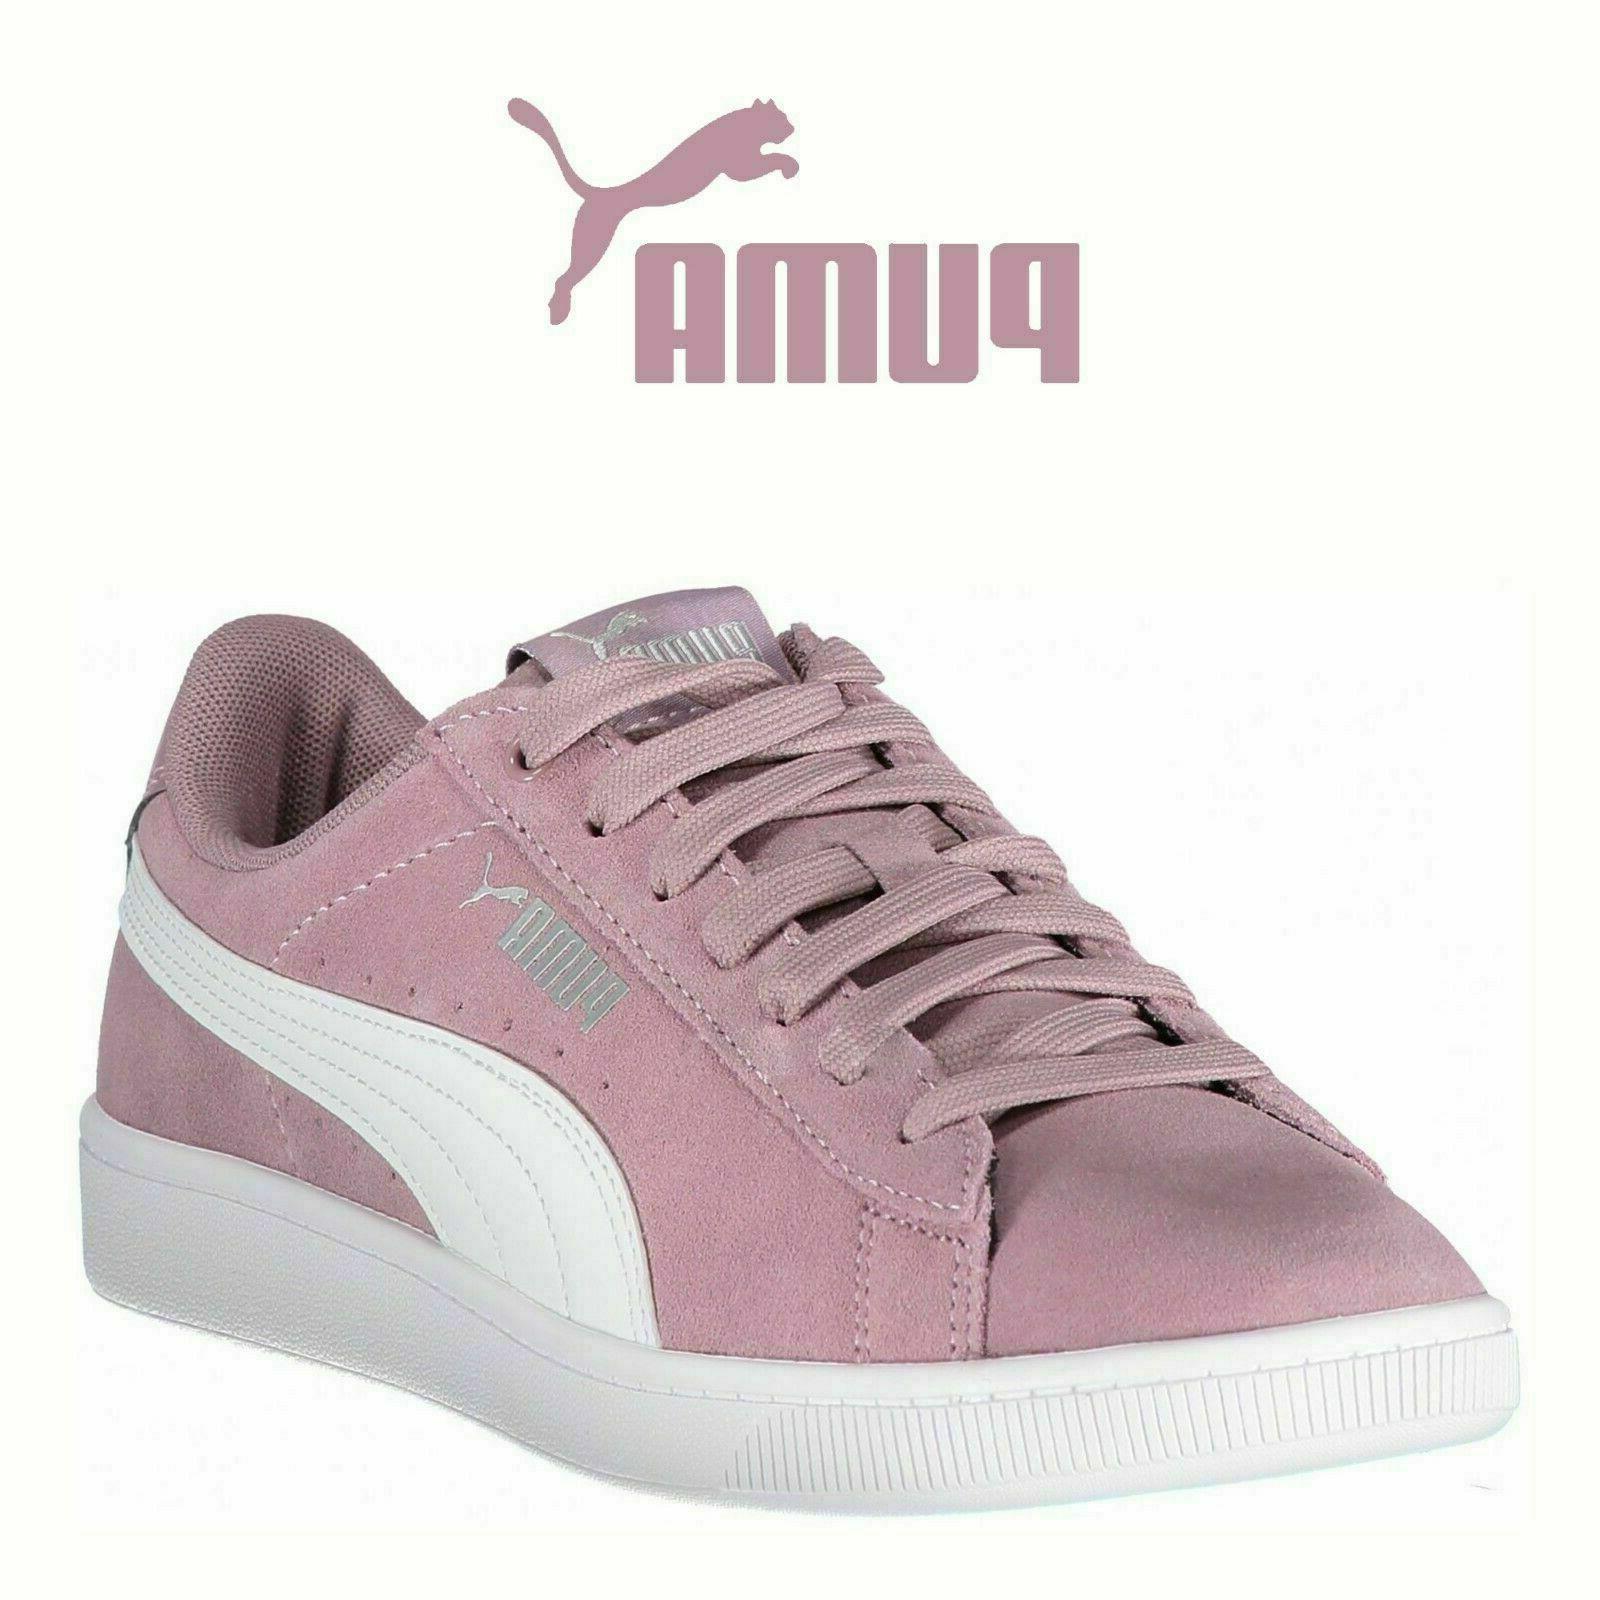 *NEW* PUMA Vikky Suede Shoes Elderberry PurPle Pink Softfoam